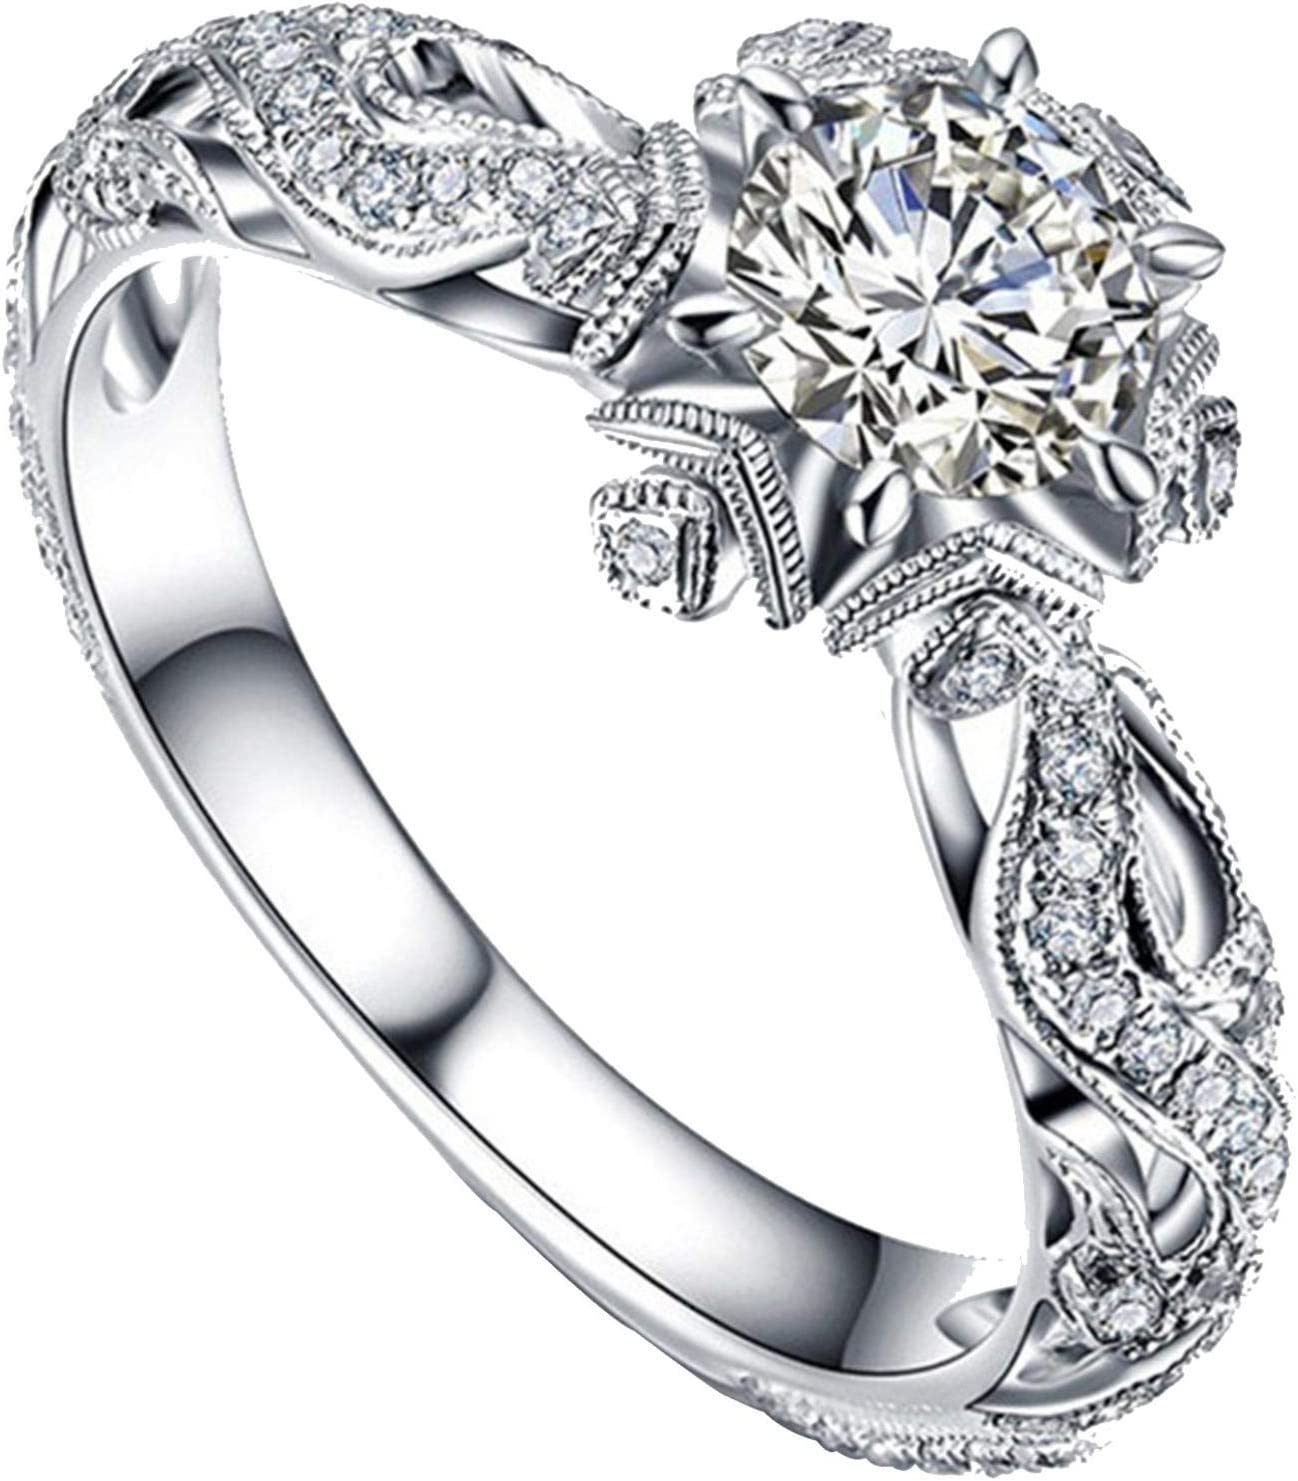 USStore Valentine's Day Jewelry Gift - Creative Cute Ring Animals Ladies Full Diamond Microinlaid Zircon Anniversary Rings (5, A)